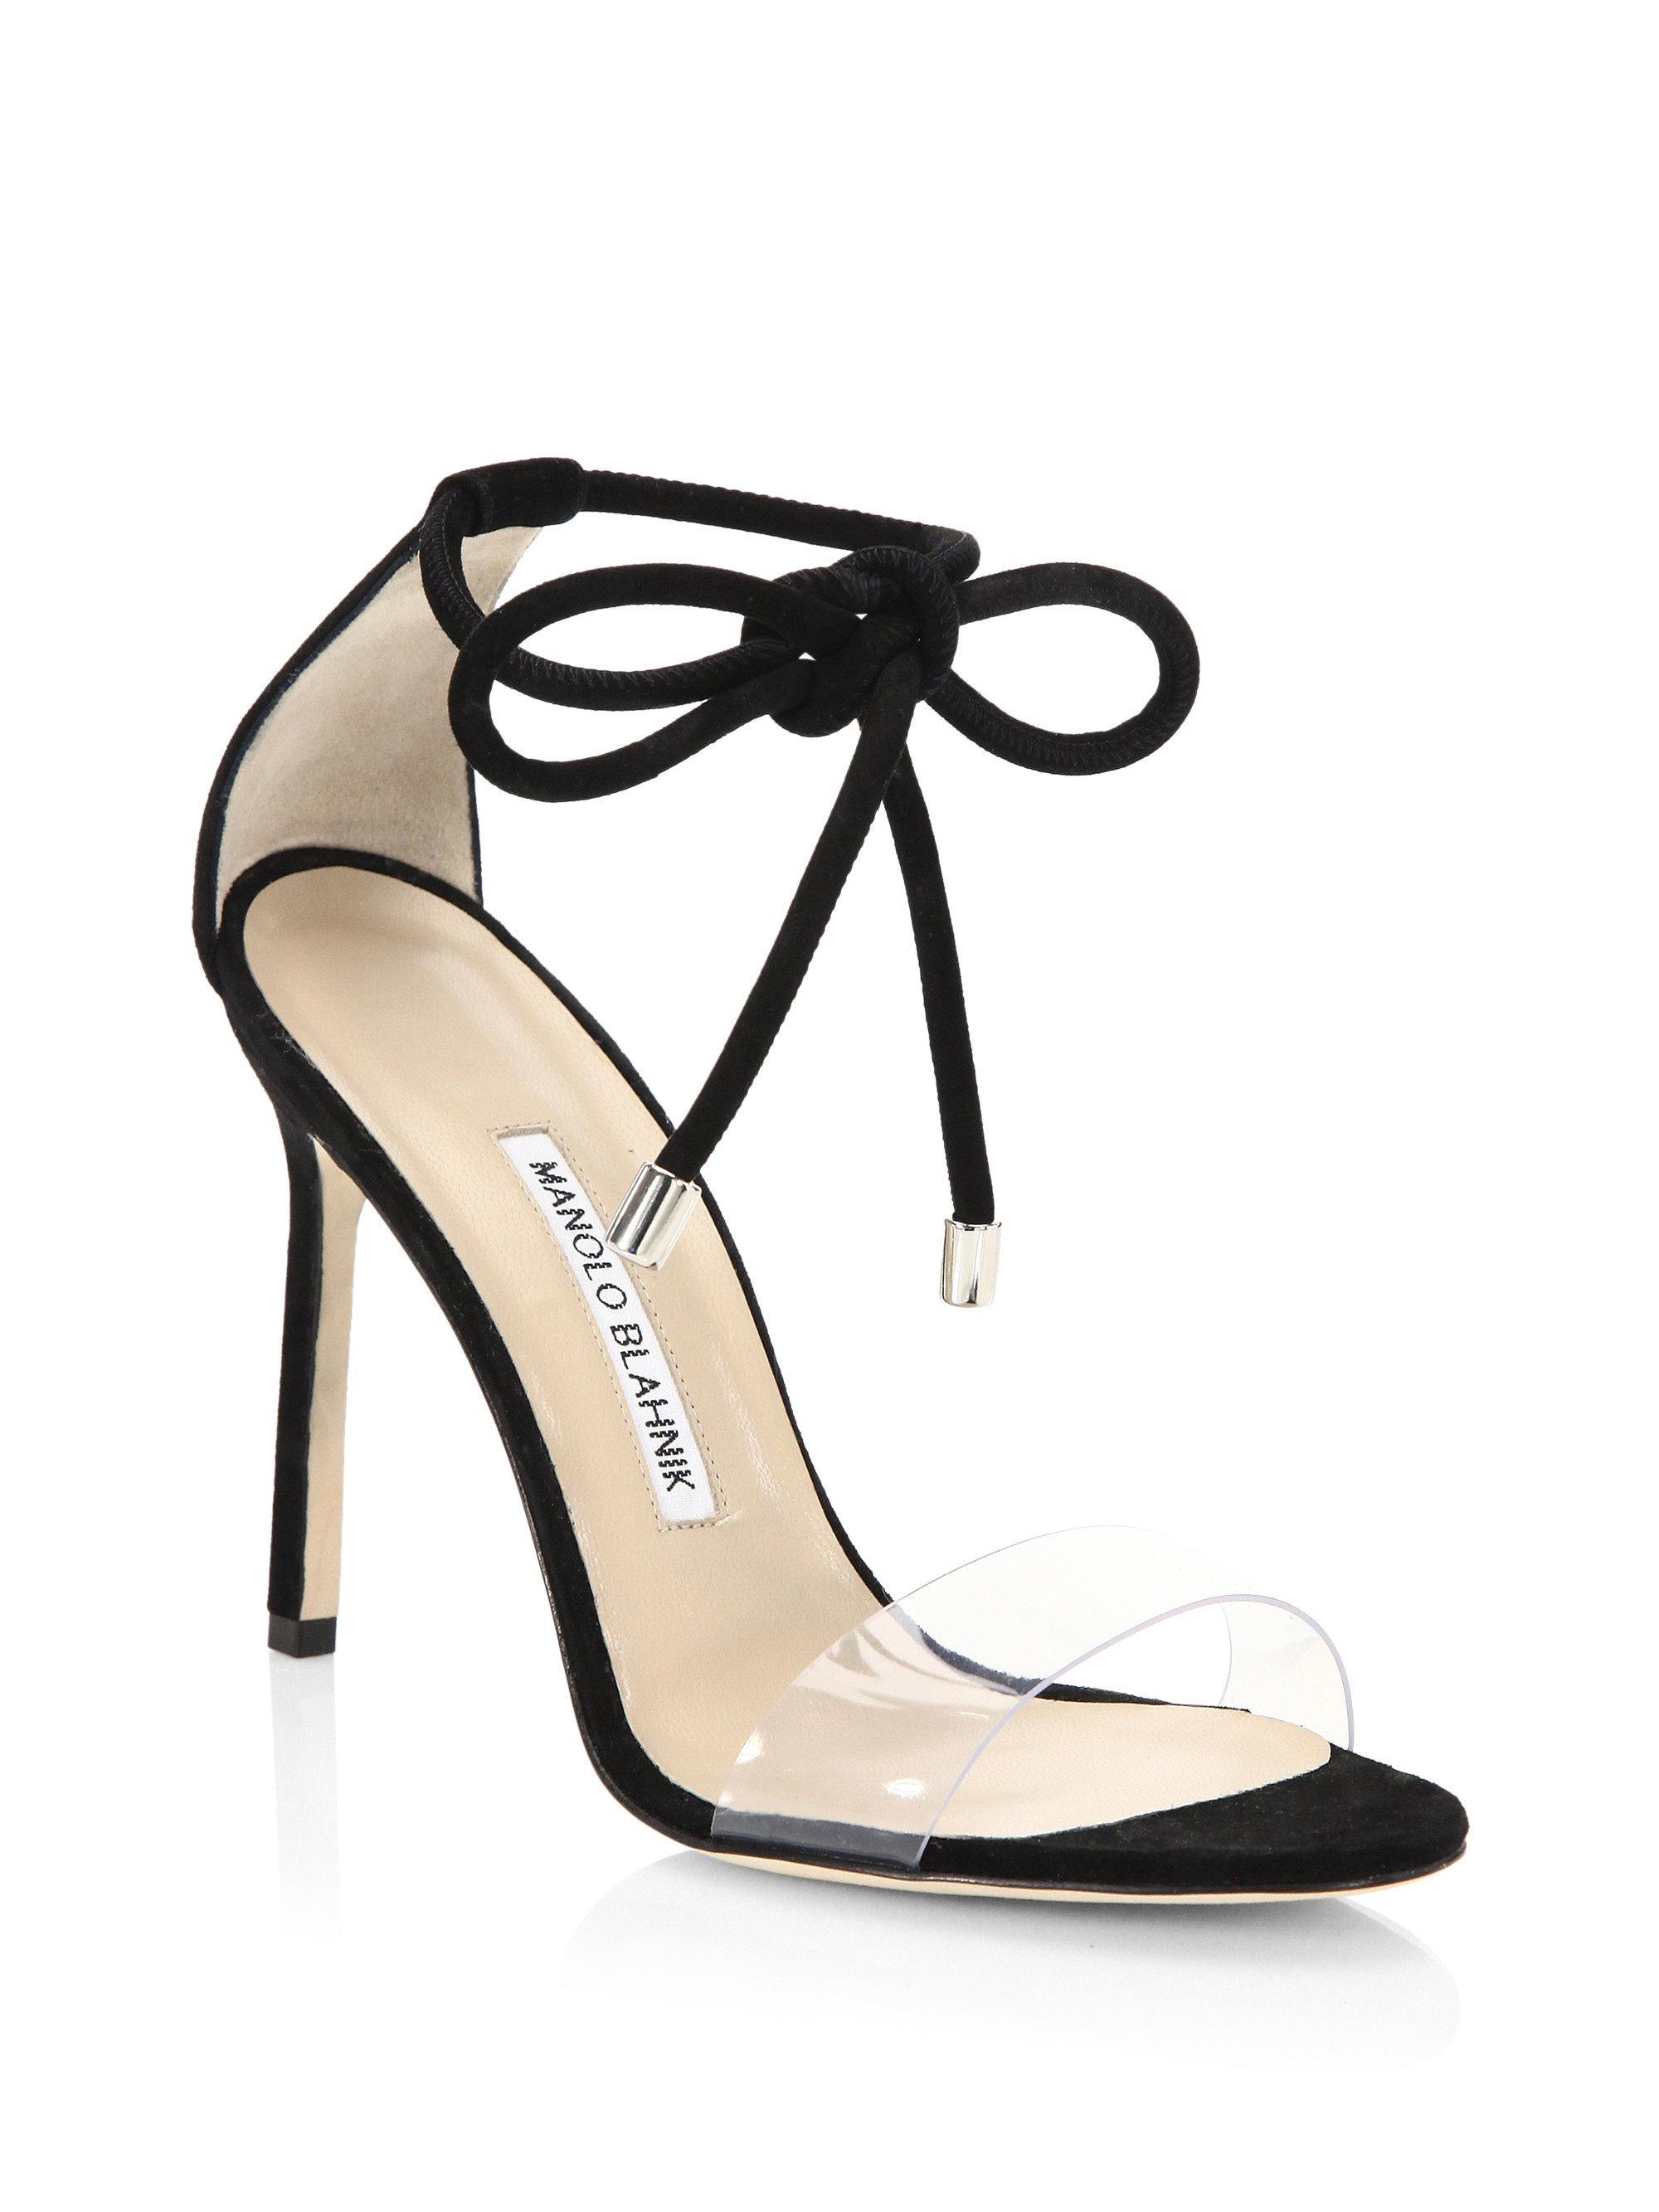 d532a9c314691 Manolo Blahnik Estro Ankle Tie Stilettos in Black - Lyst